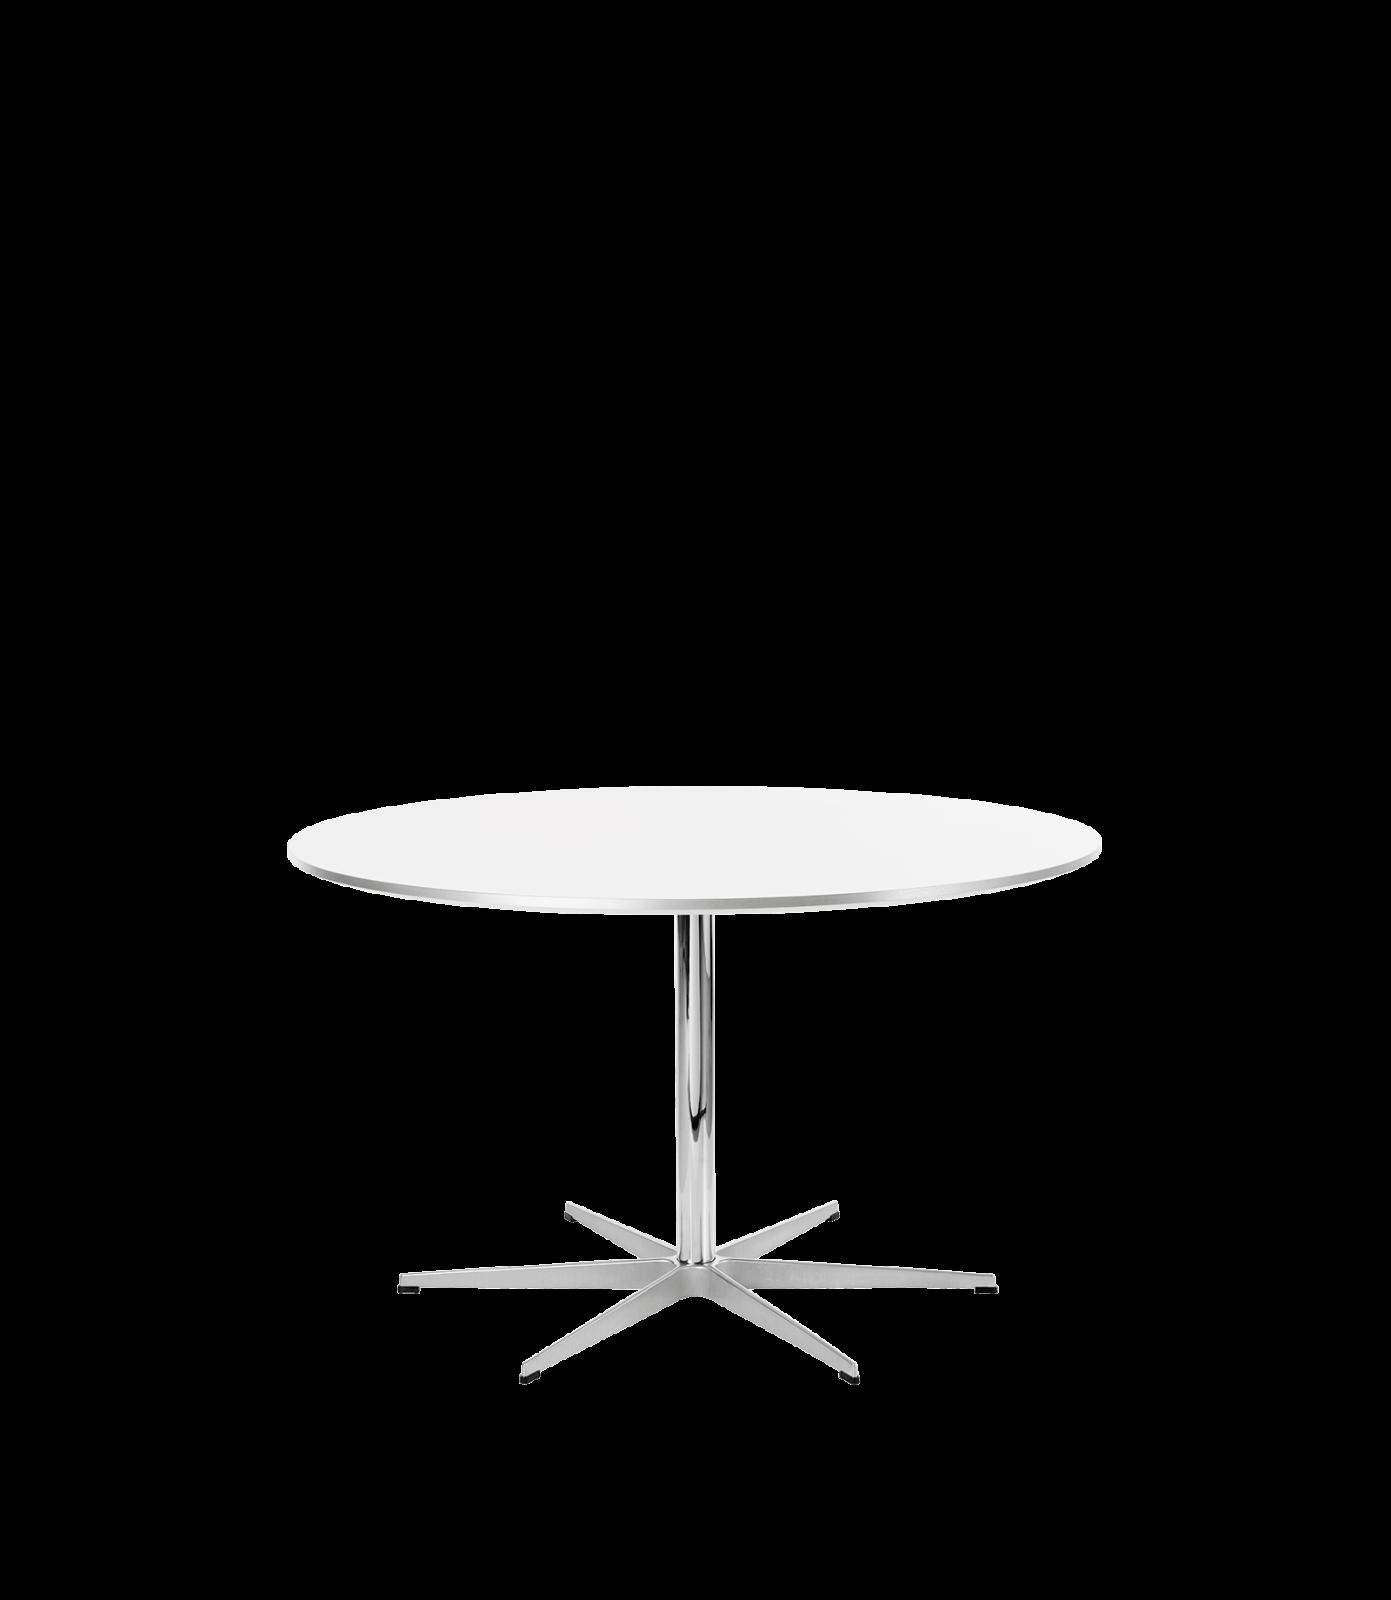 Circular Dining Table - 6-star base Laminate Standard Colour White